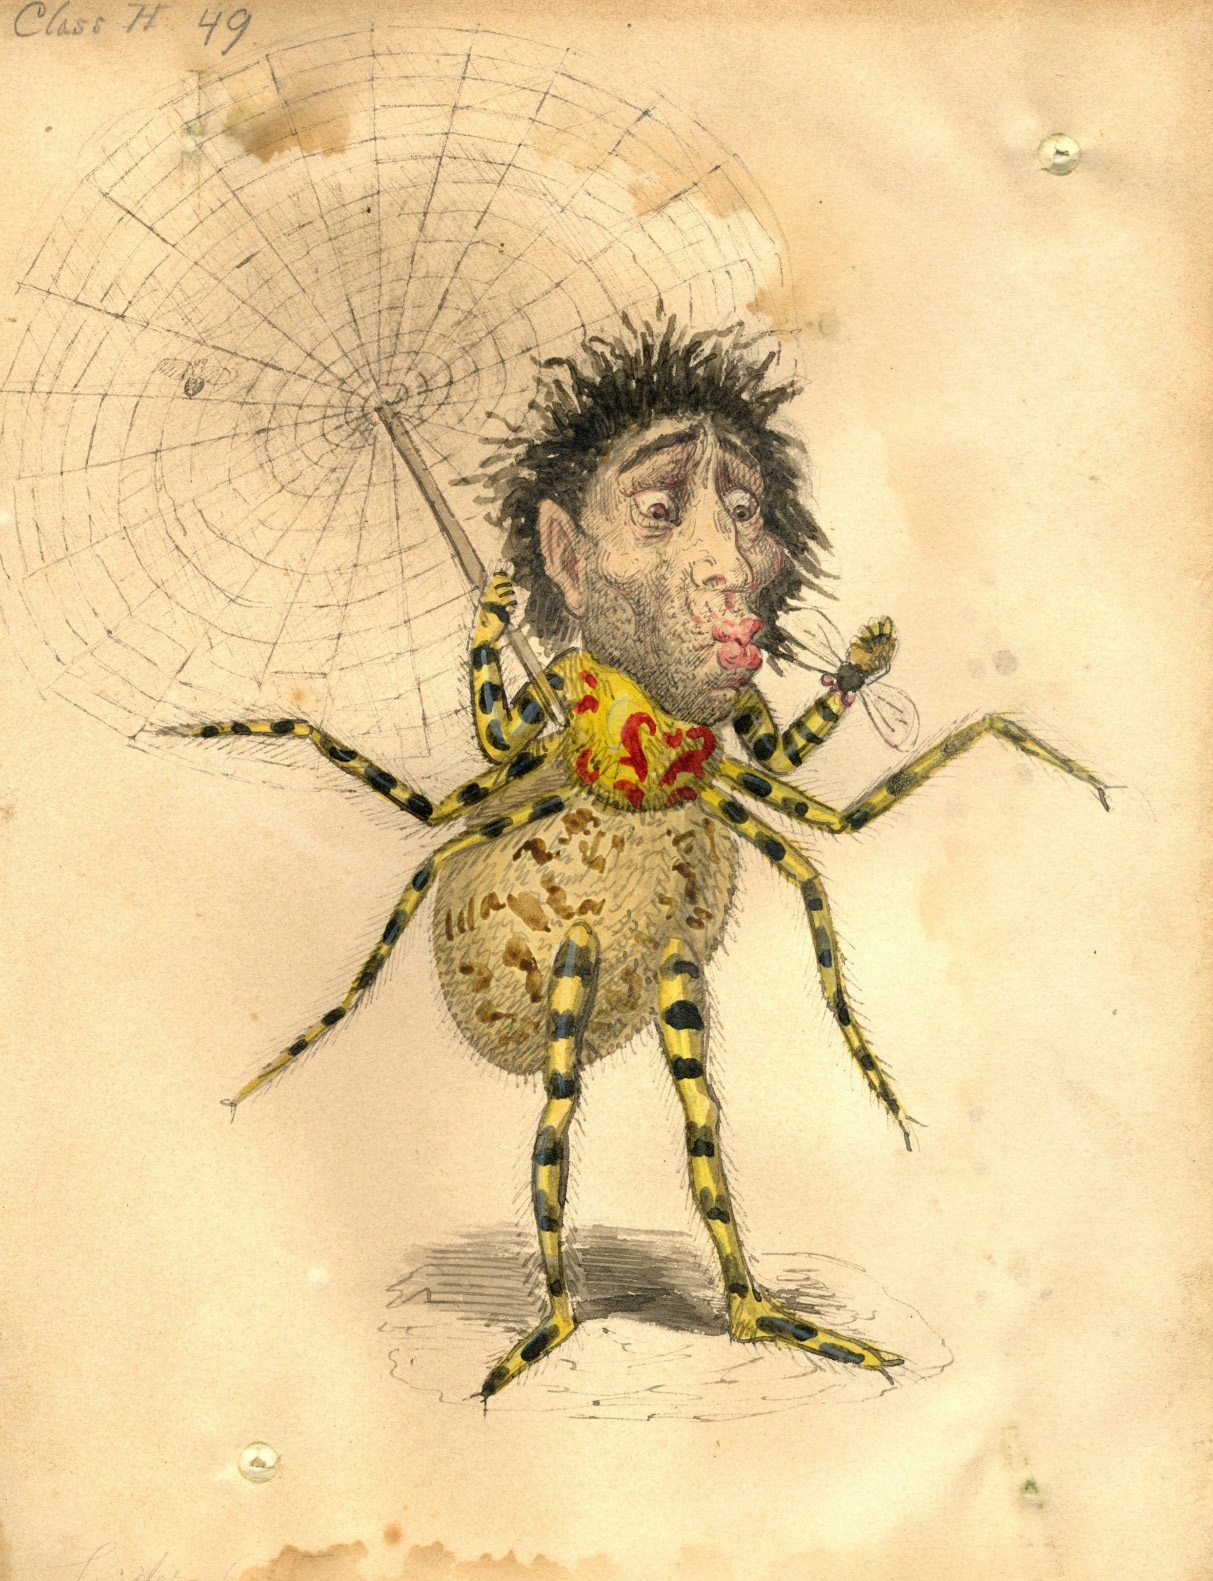 Charles Briton - Spider Costume Design, 1873